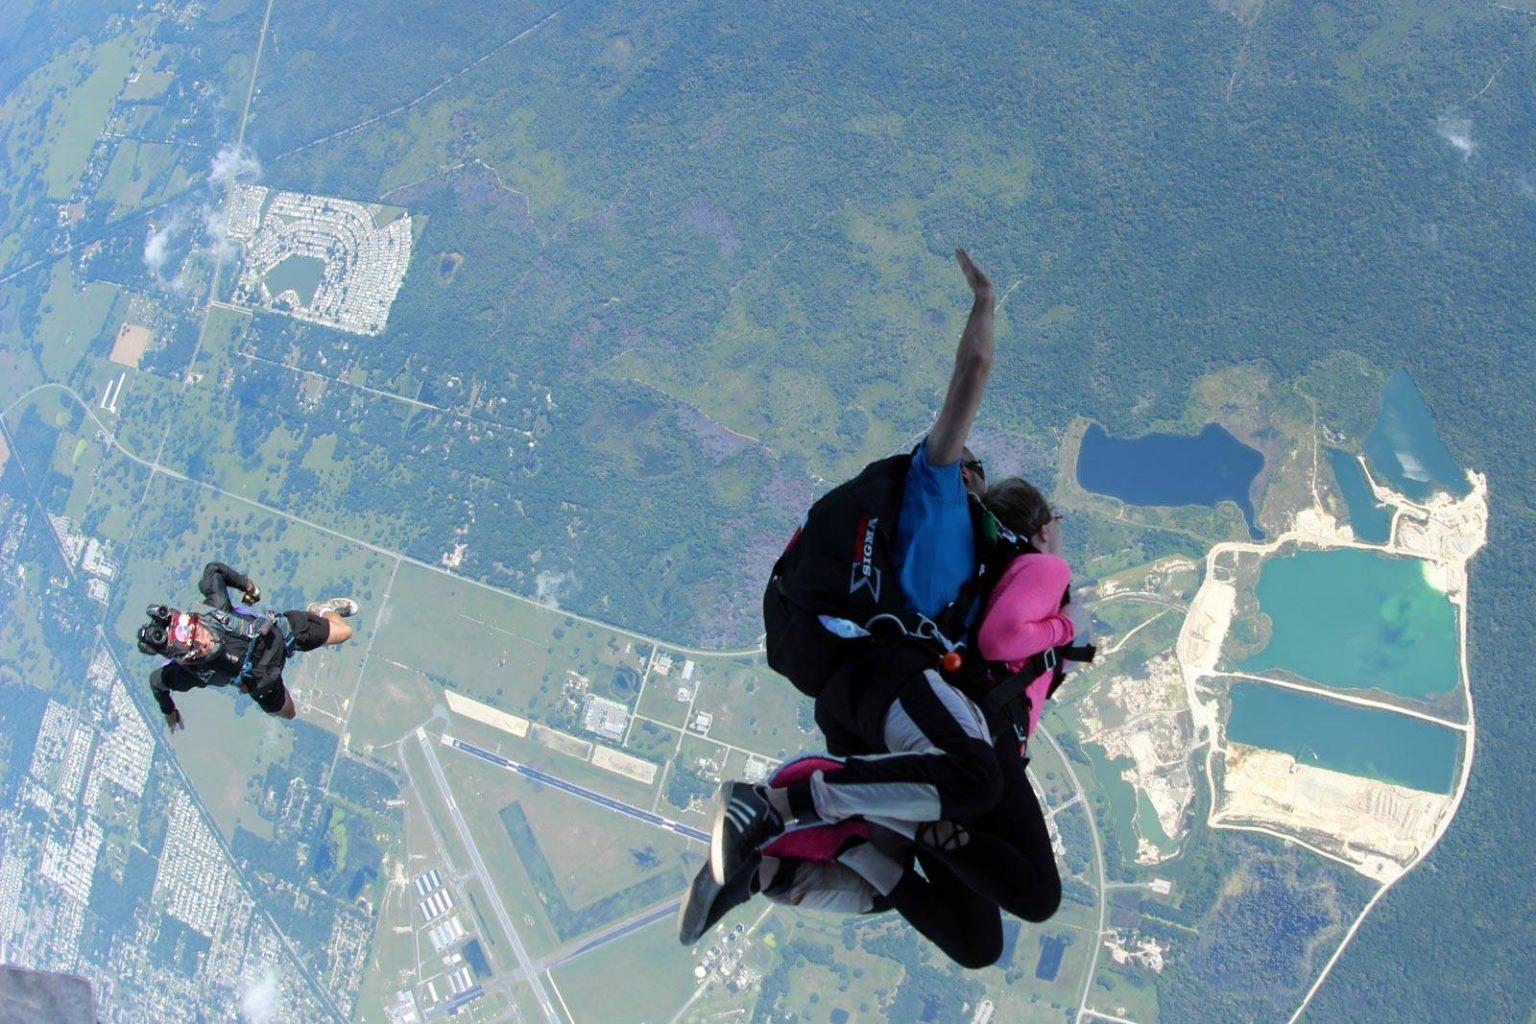 Skydive City Z-Hills | Skydiving Tampa & St. Petersburg, FL